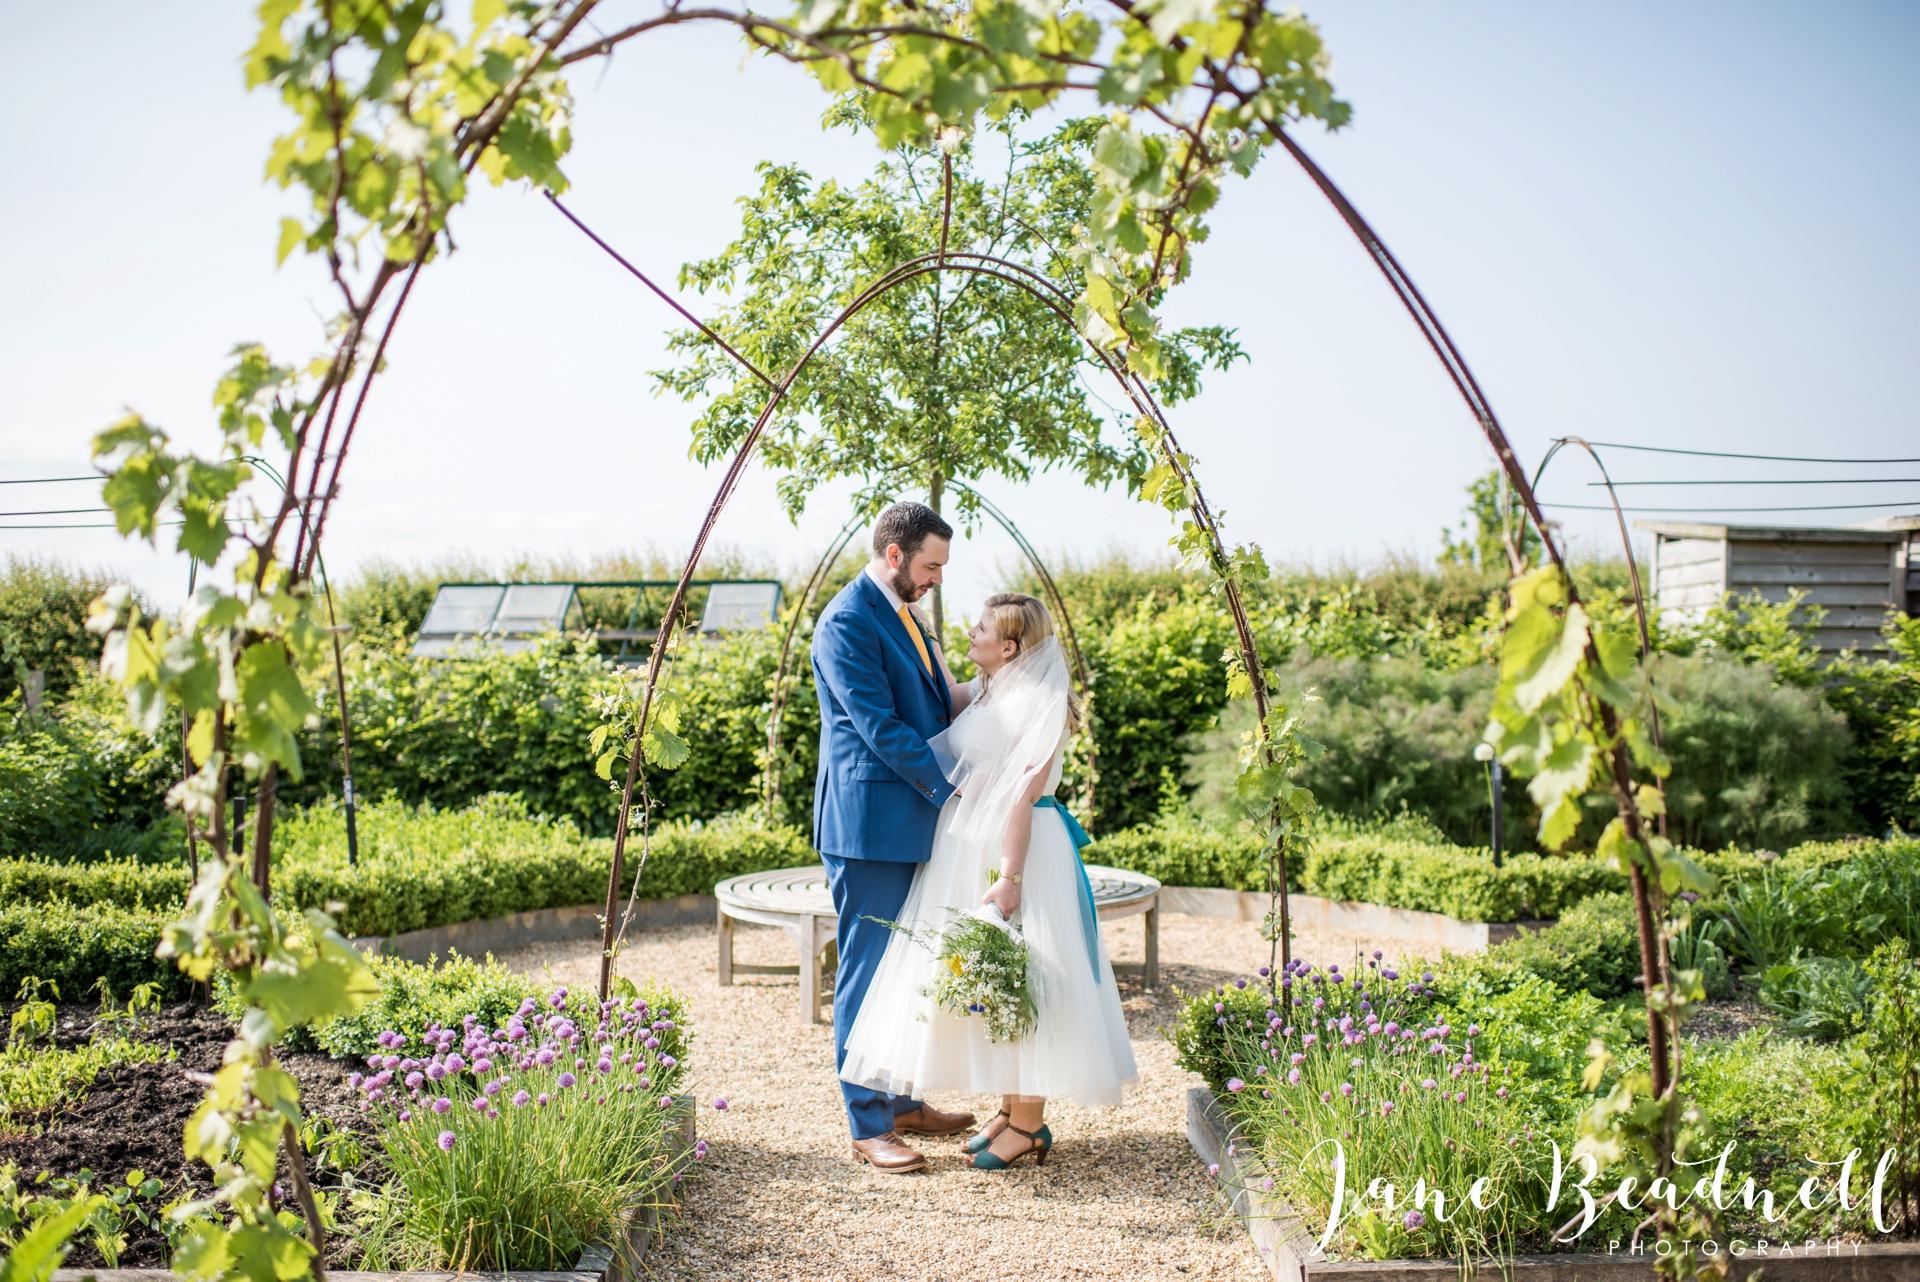 South Farm Wedding photography Hertfordshire by Jane Beadnell Photography fine art wedding photographer_0121